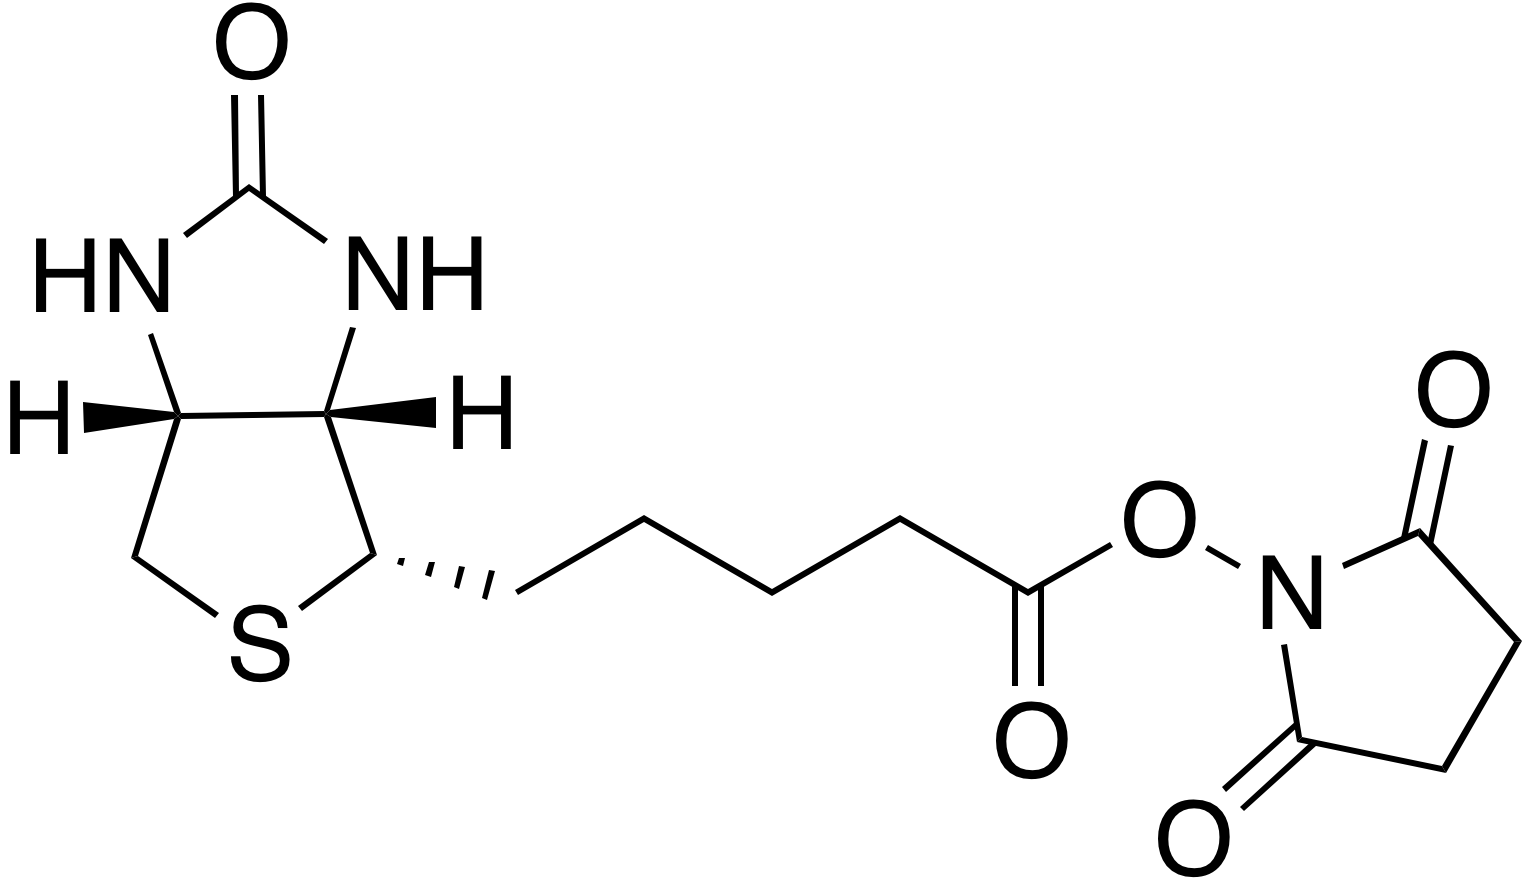 (+)-Biotin N-hydroxysuccinimide ester